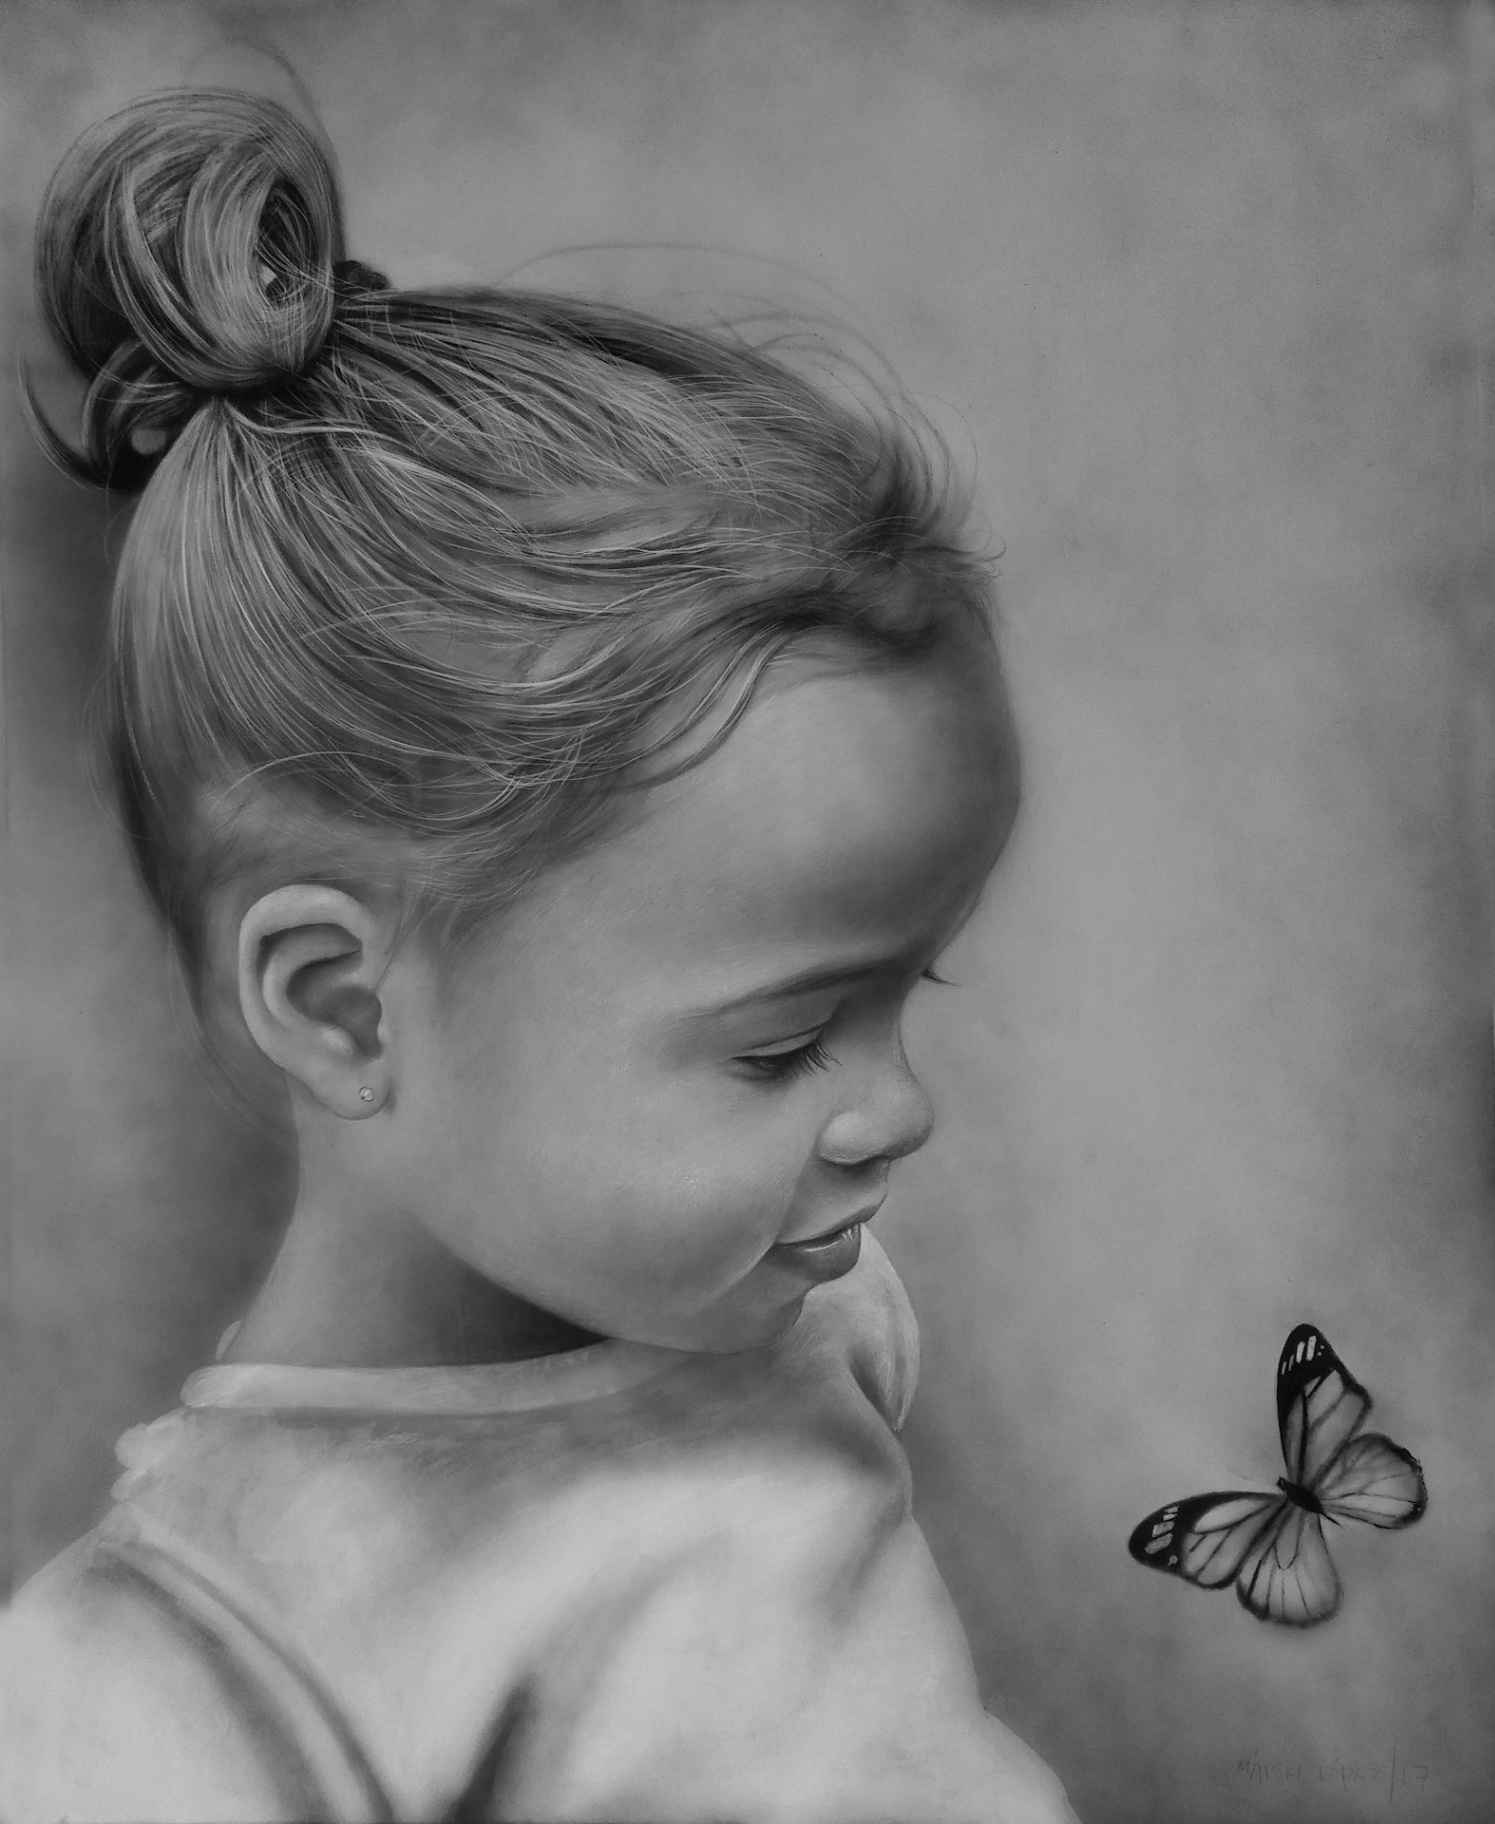 Obra: Bebe con mariposa